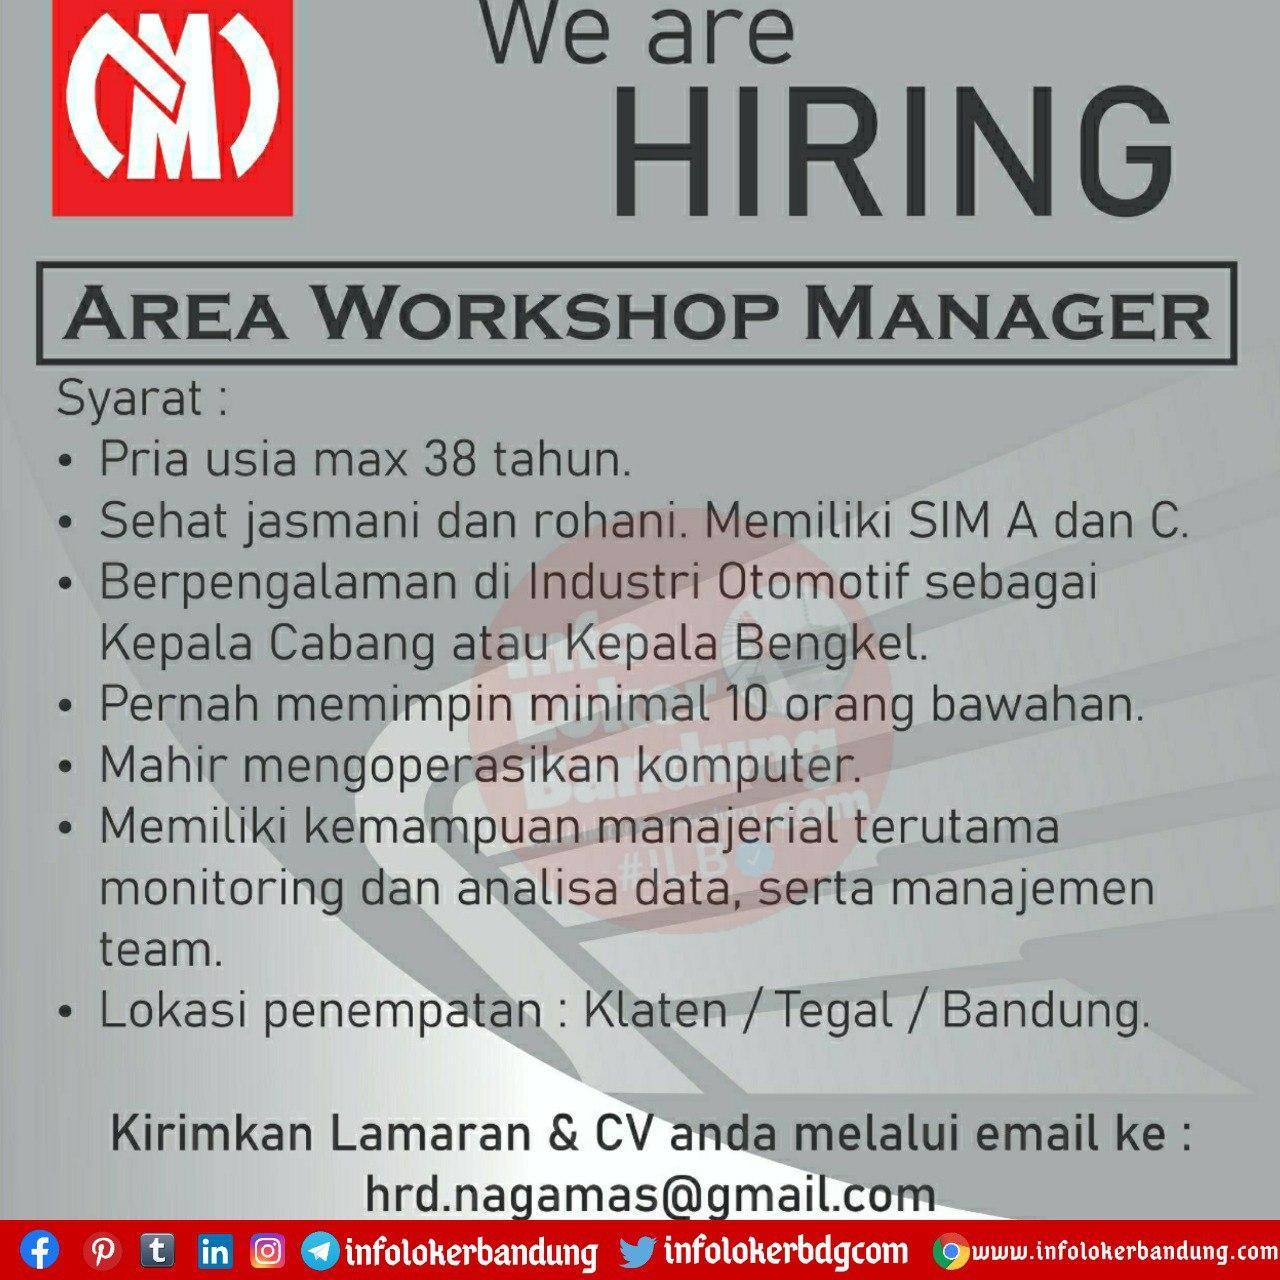 Lowongan Kerja Area Workshop Manager Bandung Oktober 2020